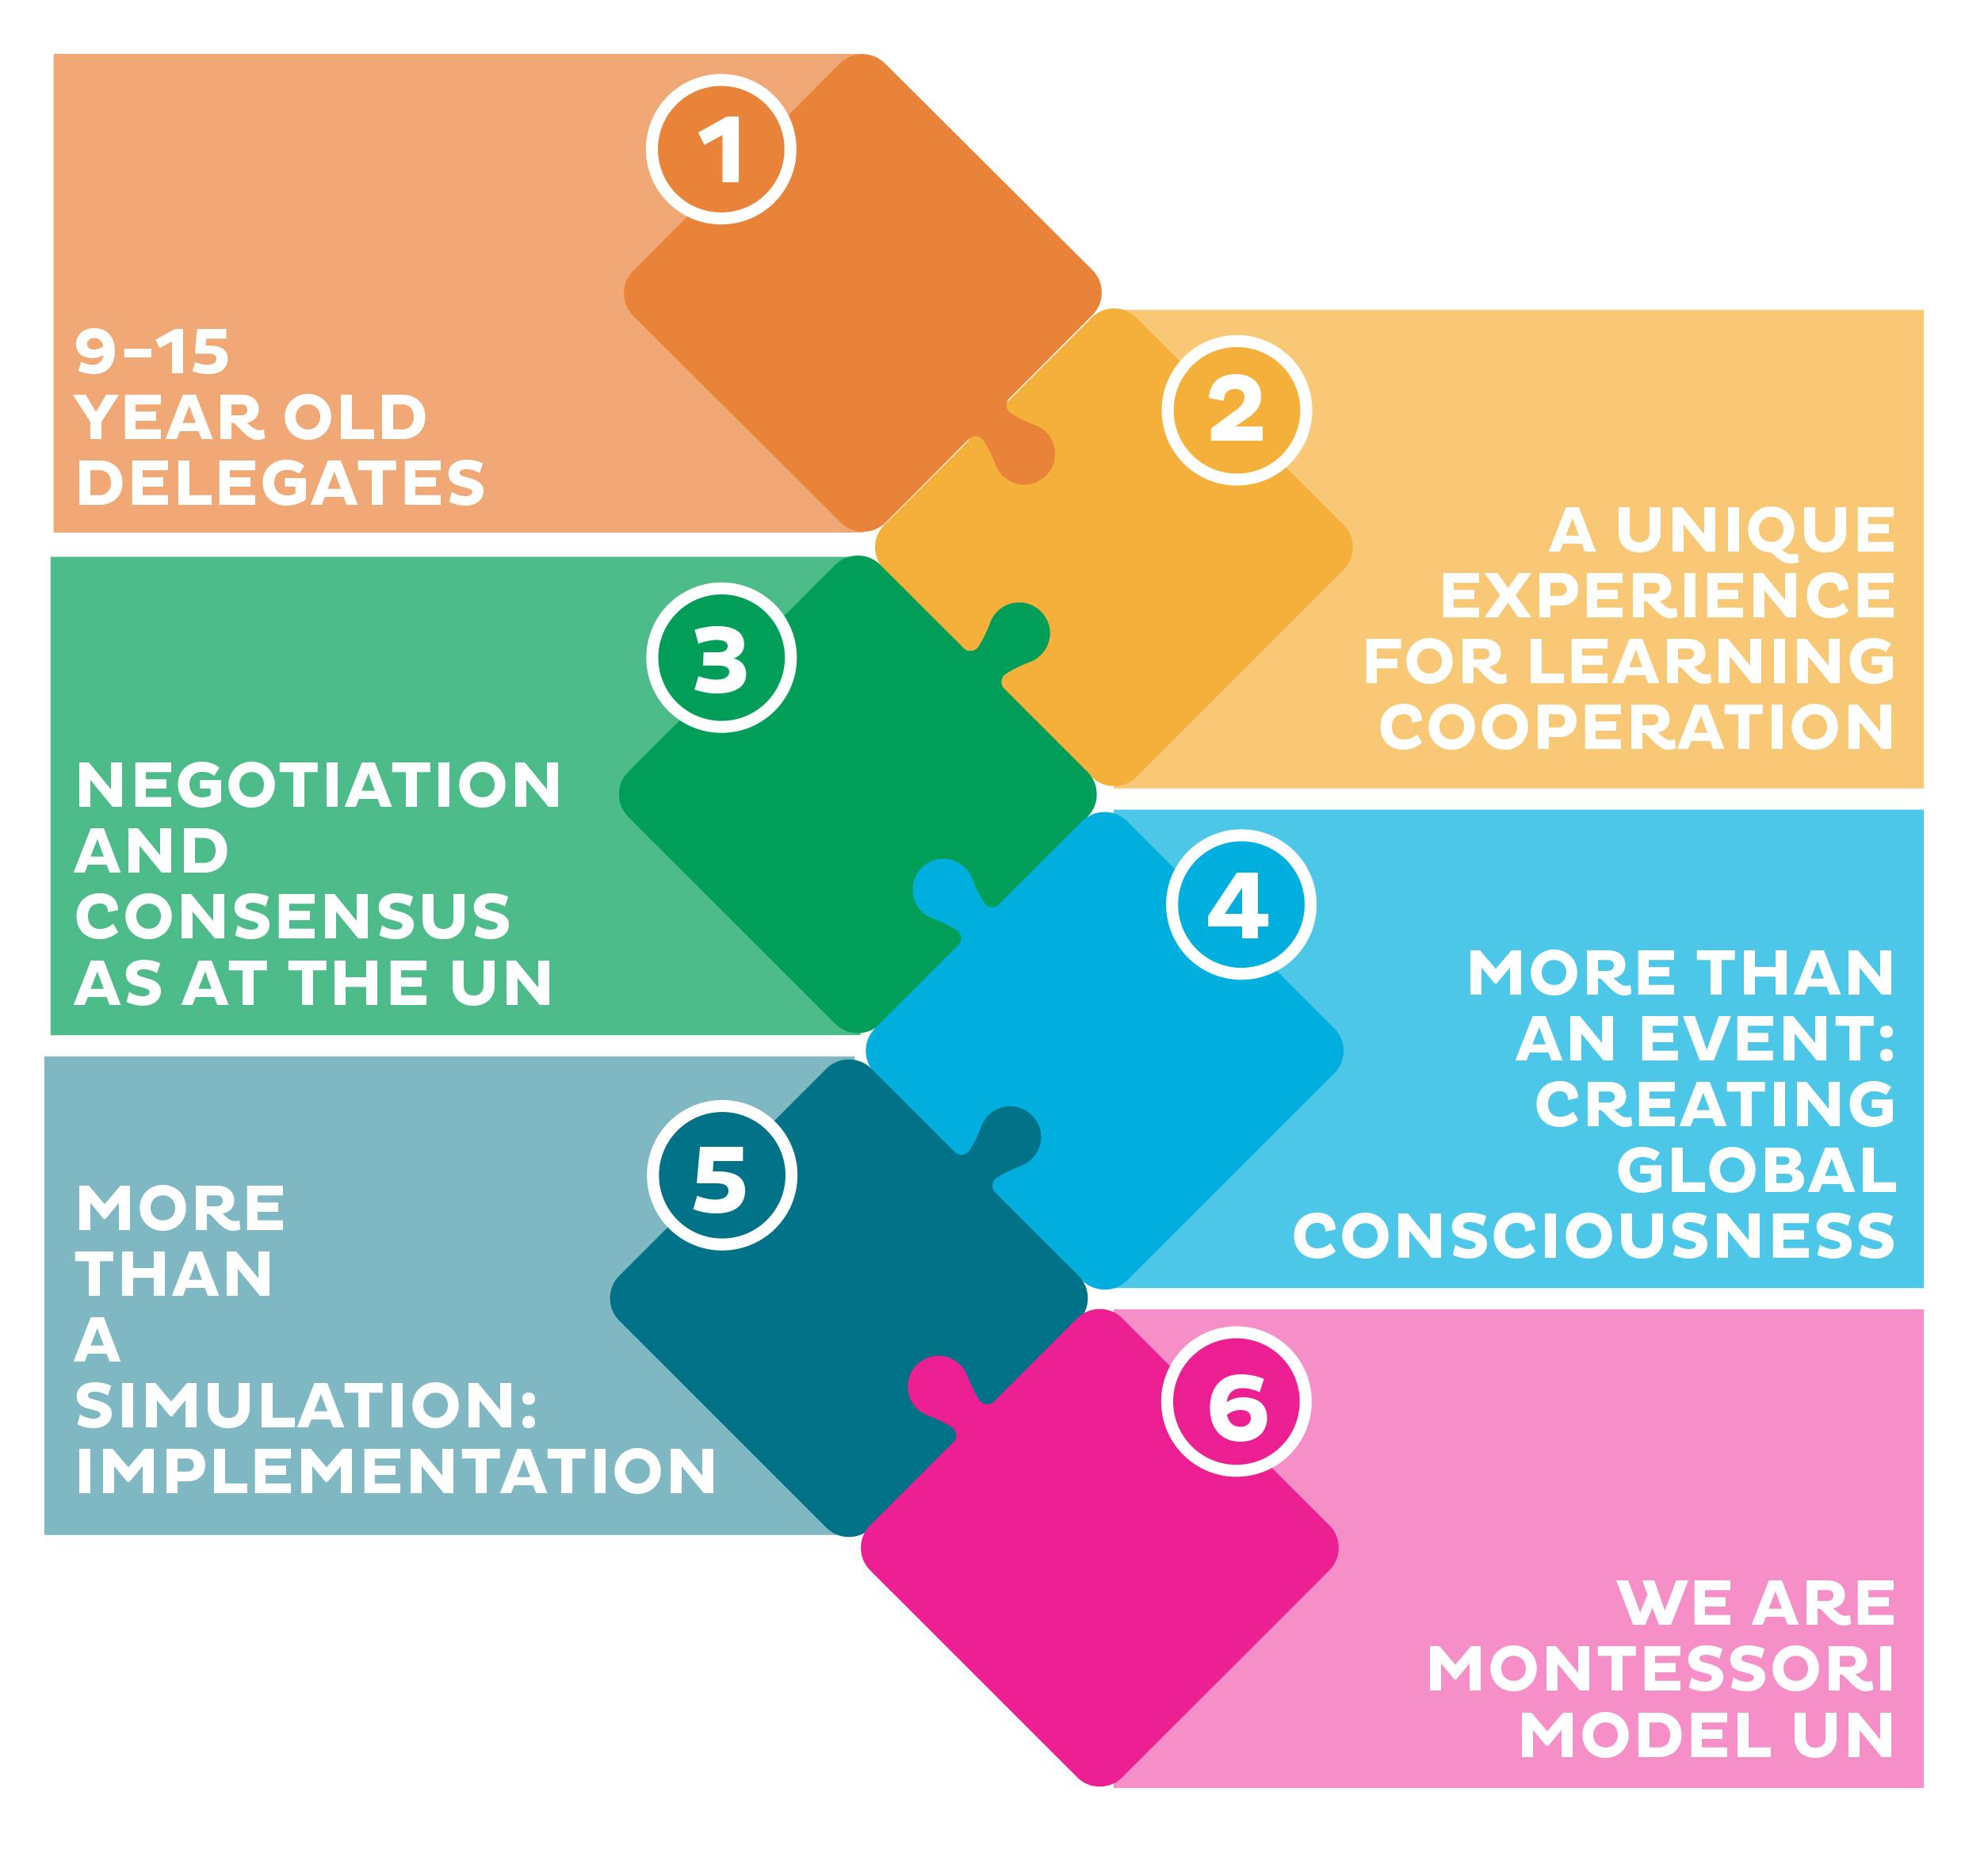 Six characteristics of the Montessori Model United Nations